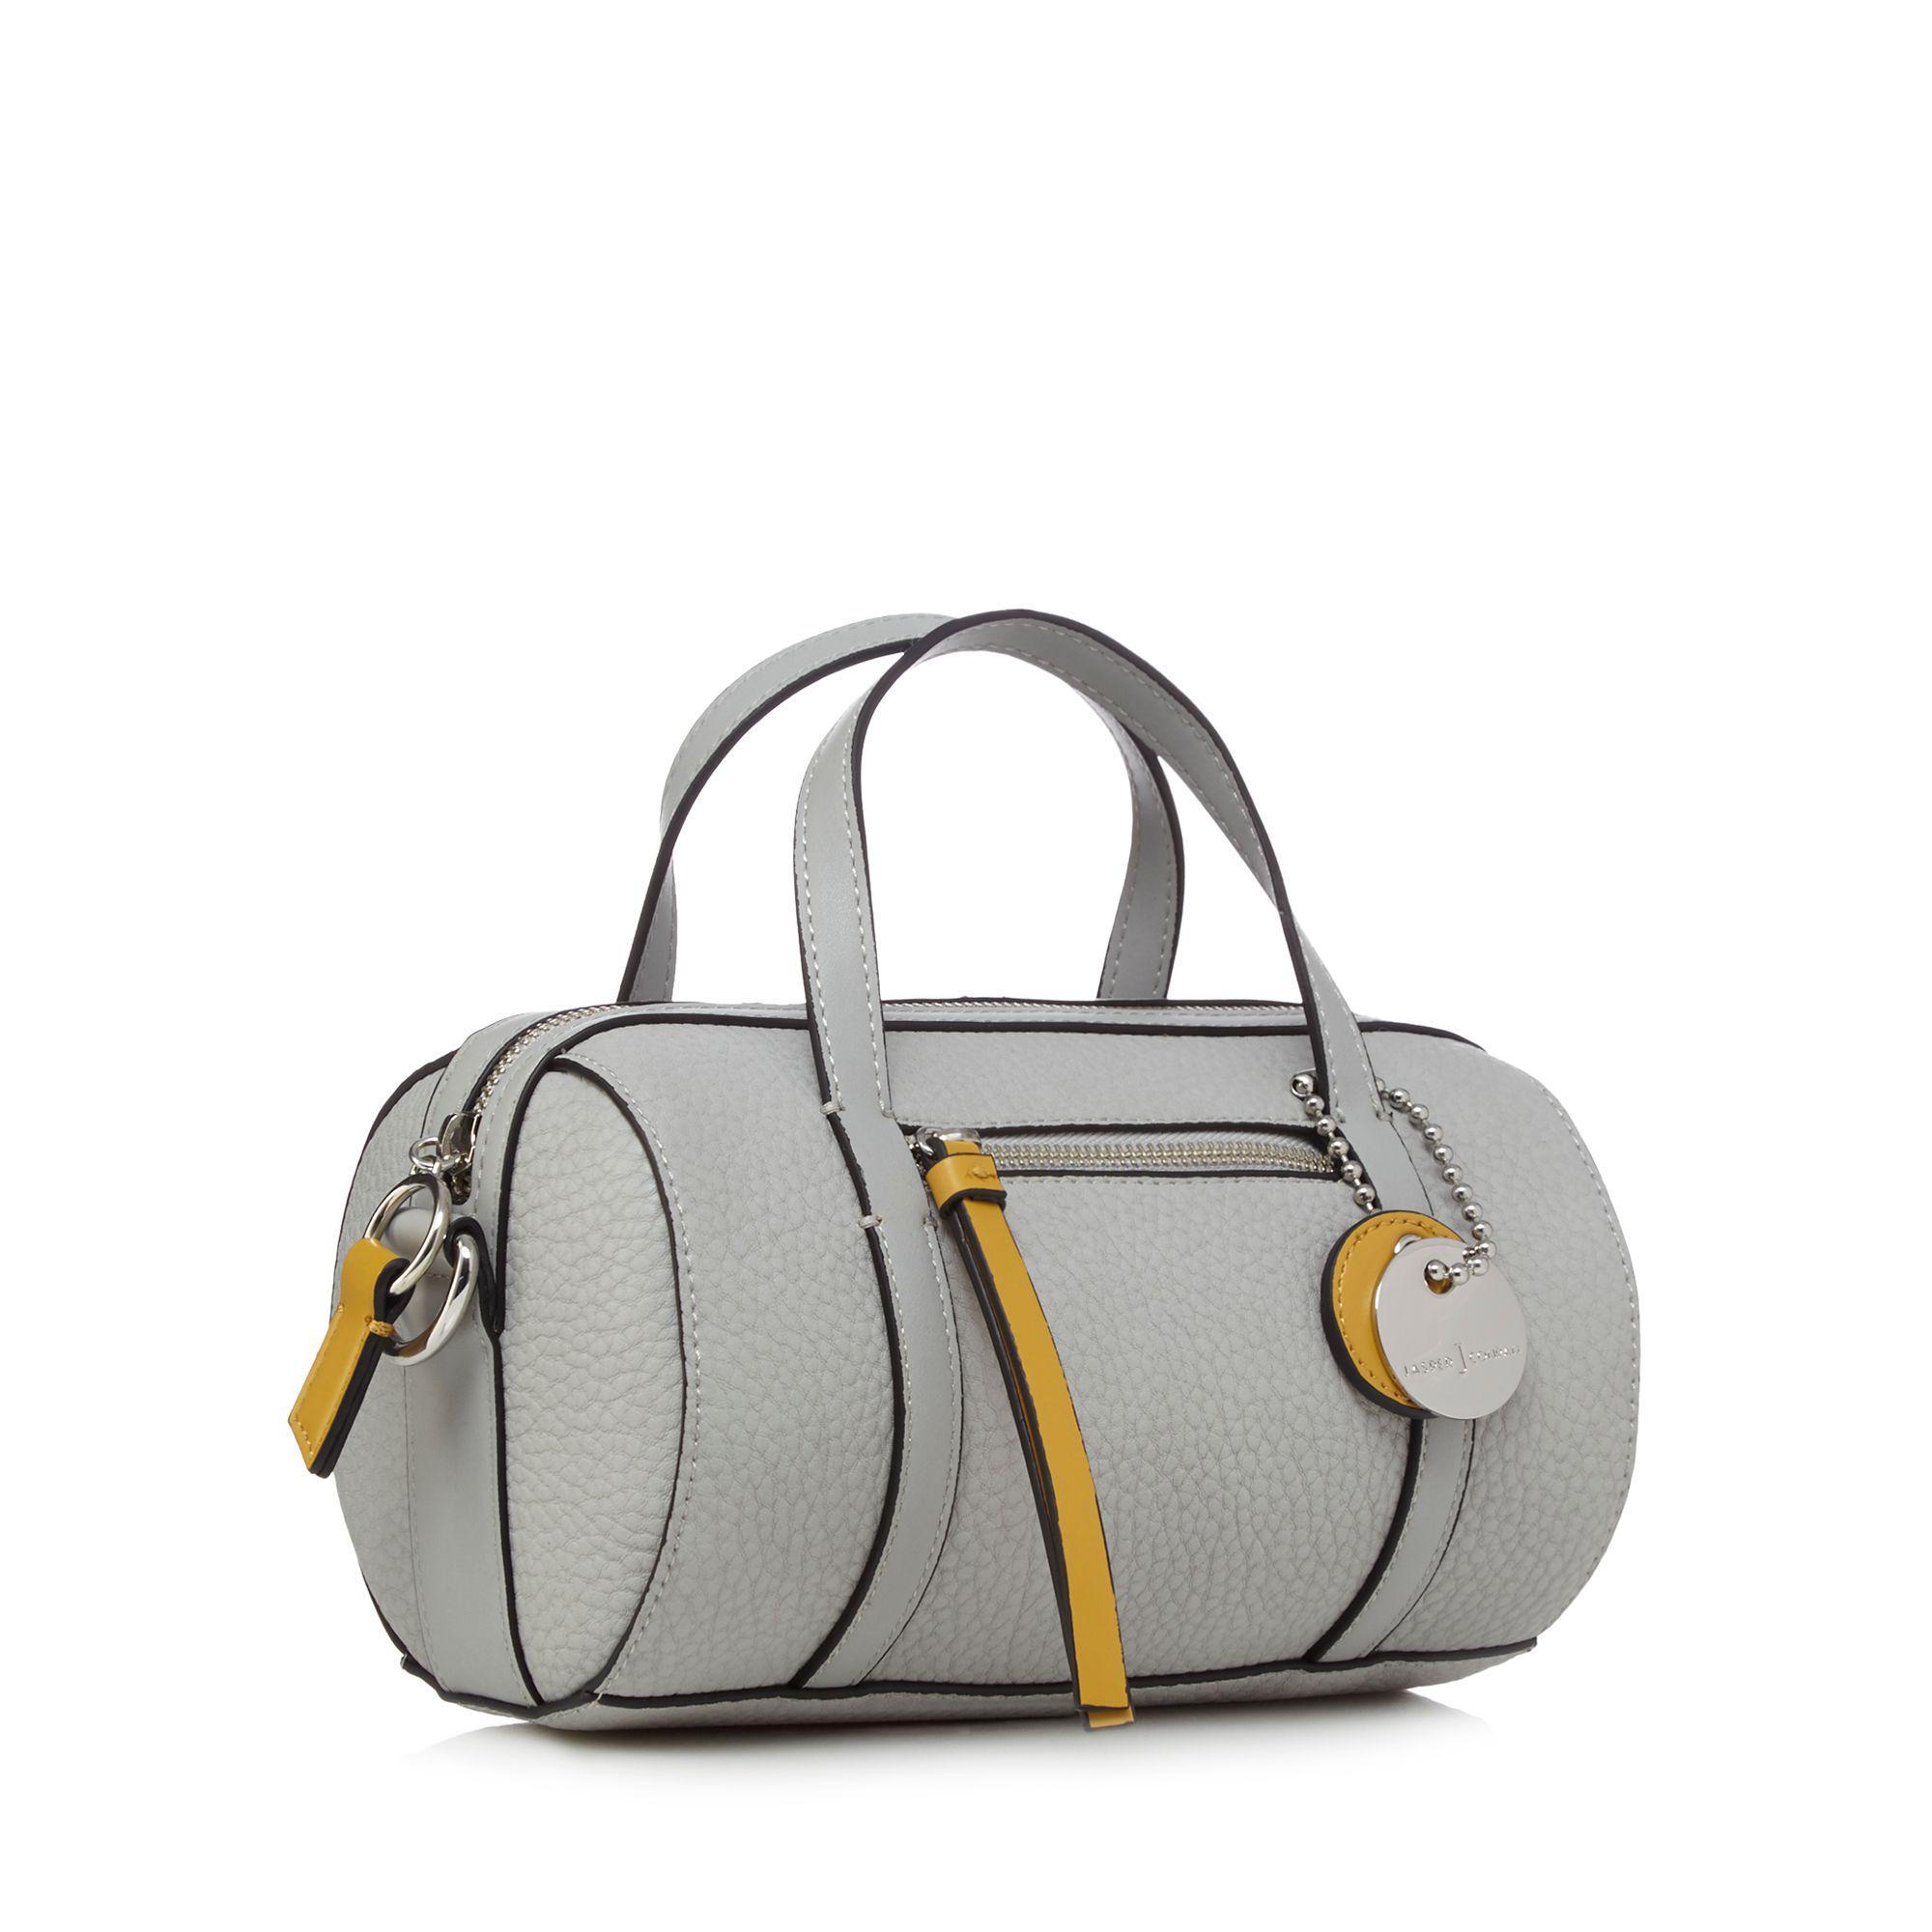 J By Jasper Conran Grey Circular Barrel Cross Body Bag in Grey